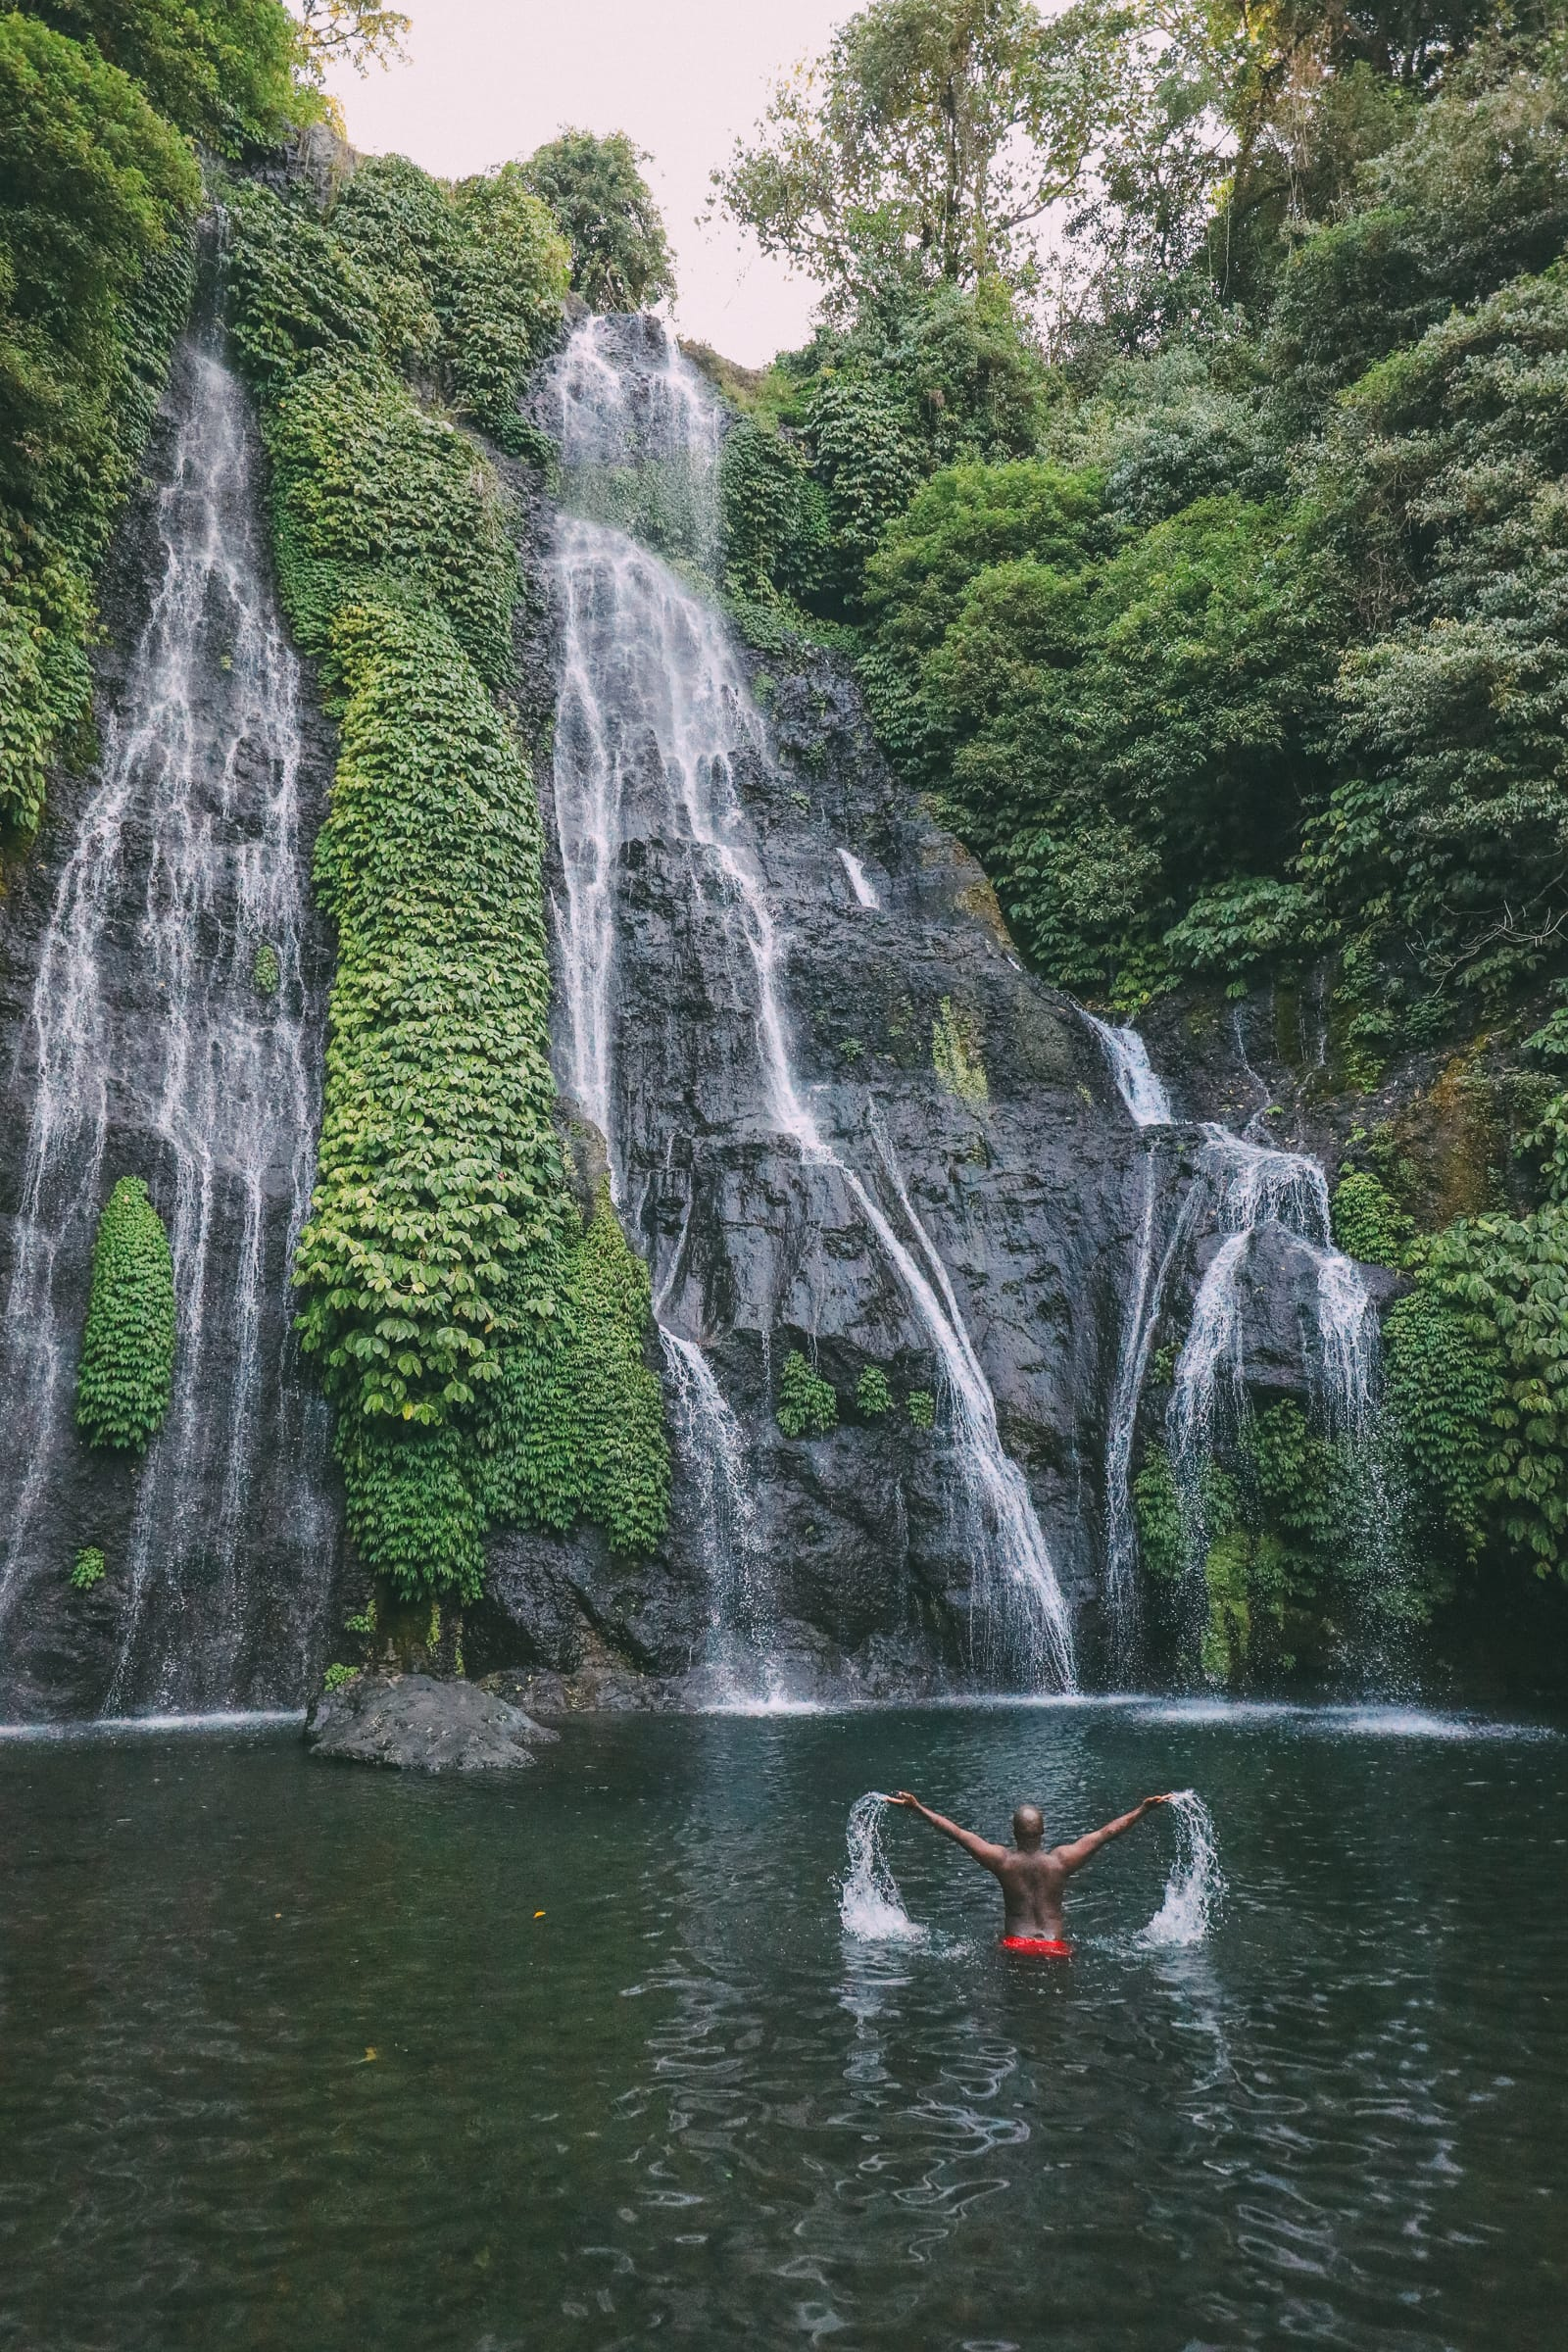 The Amazing Banyumala Twin Waterfalls In The Jungles Of Bali (17)